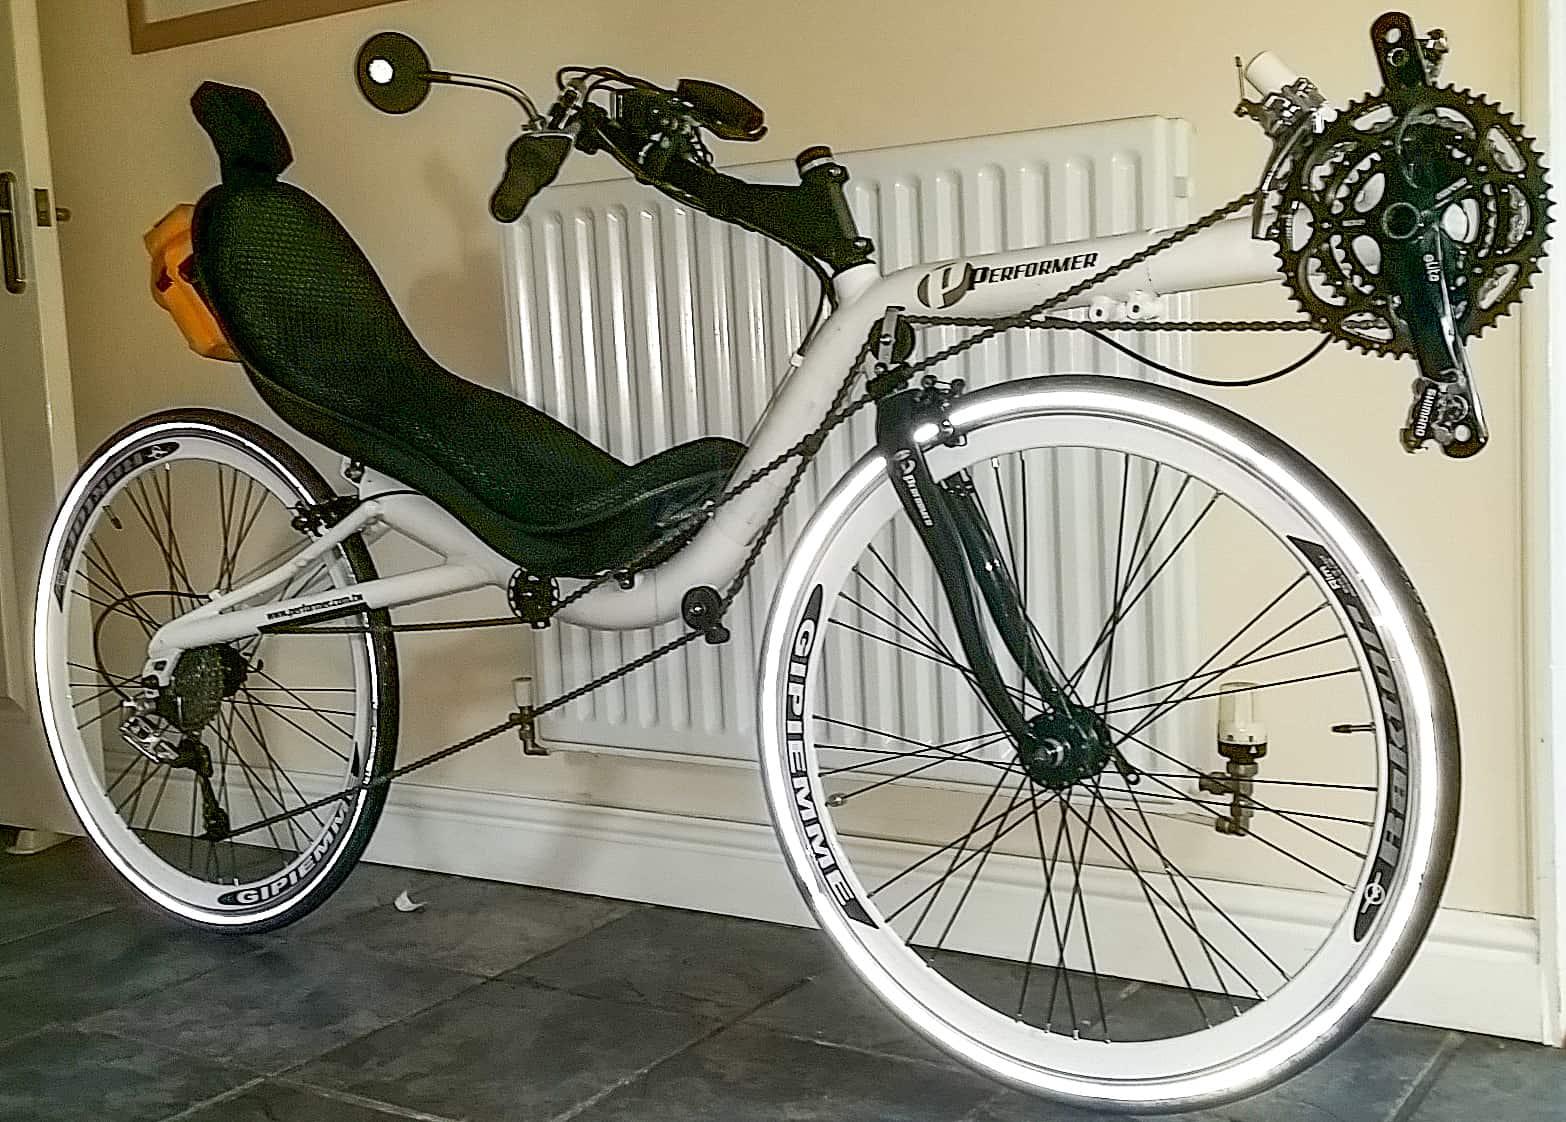 Recumbent Bikes - Recumbent Trikes - Tandem Bikes | Performer Cycles